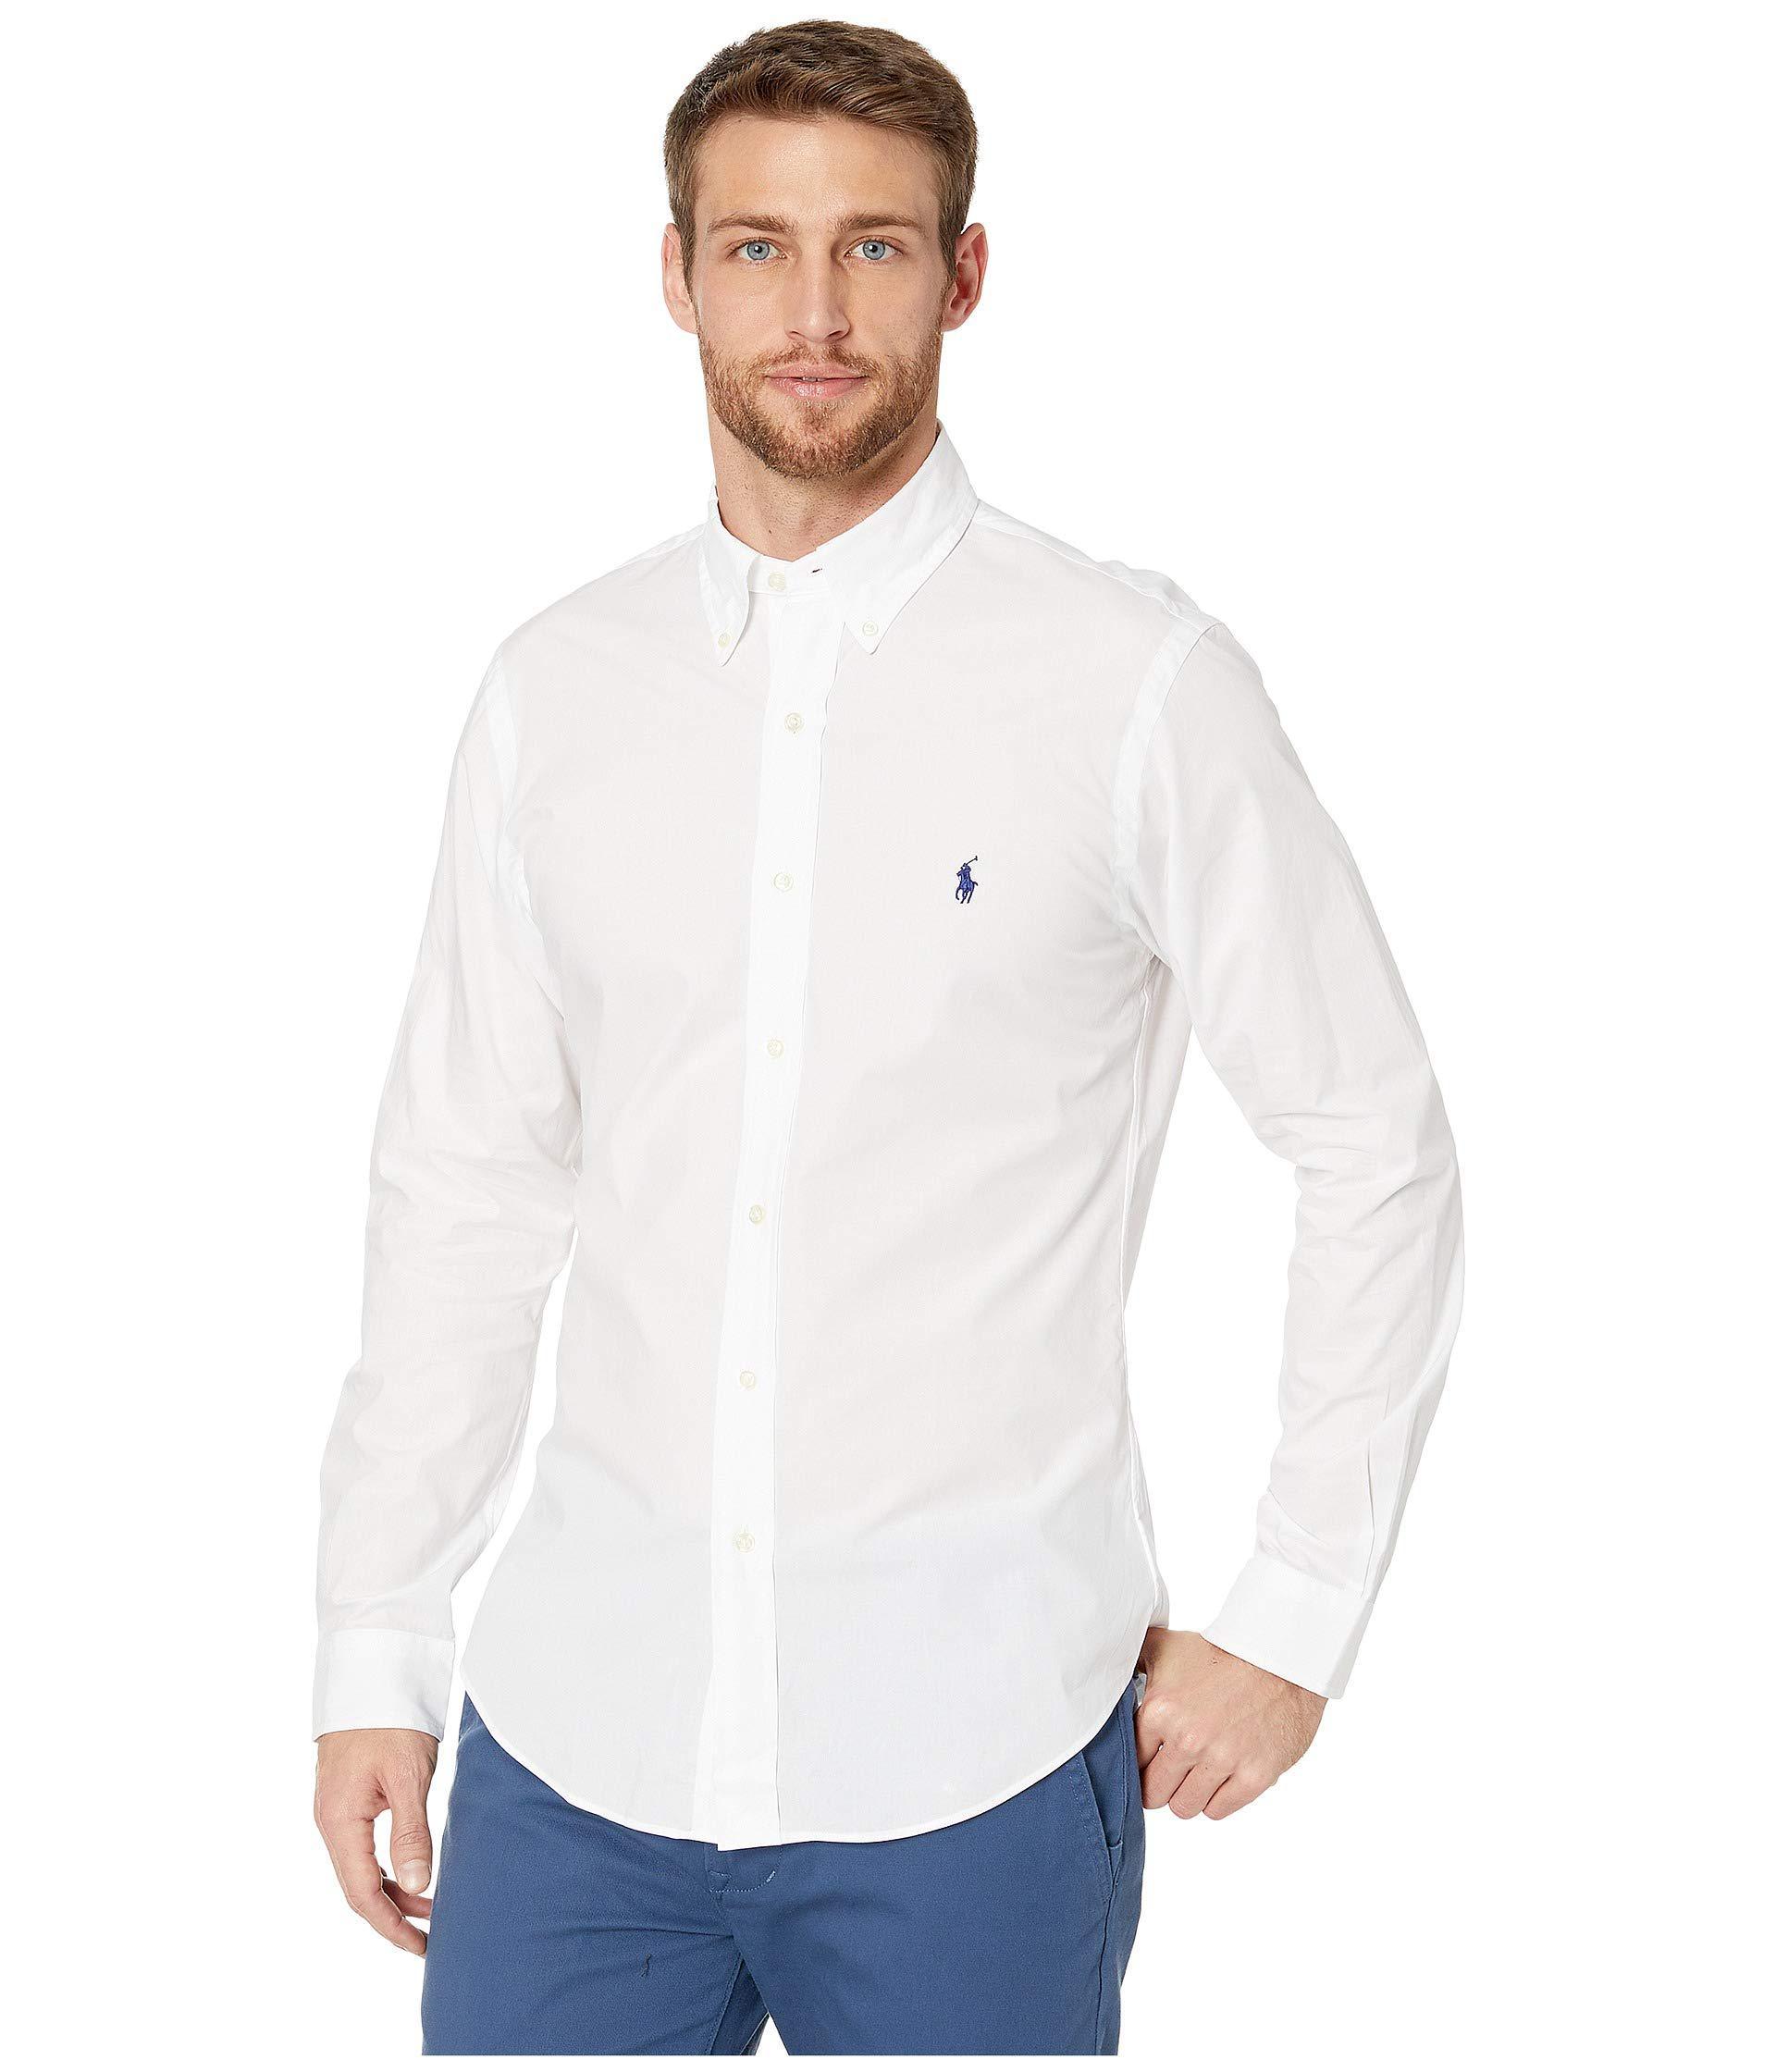 564d61a3bdf0c Lyst - Polo Ralph Lauren Slim Fit Poplin Sports Shirt (polo Black ...